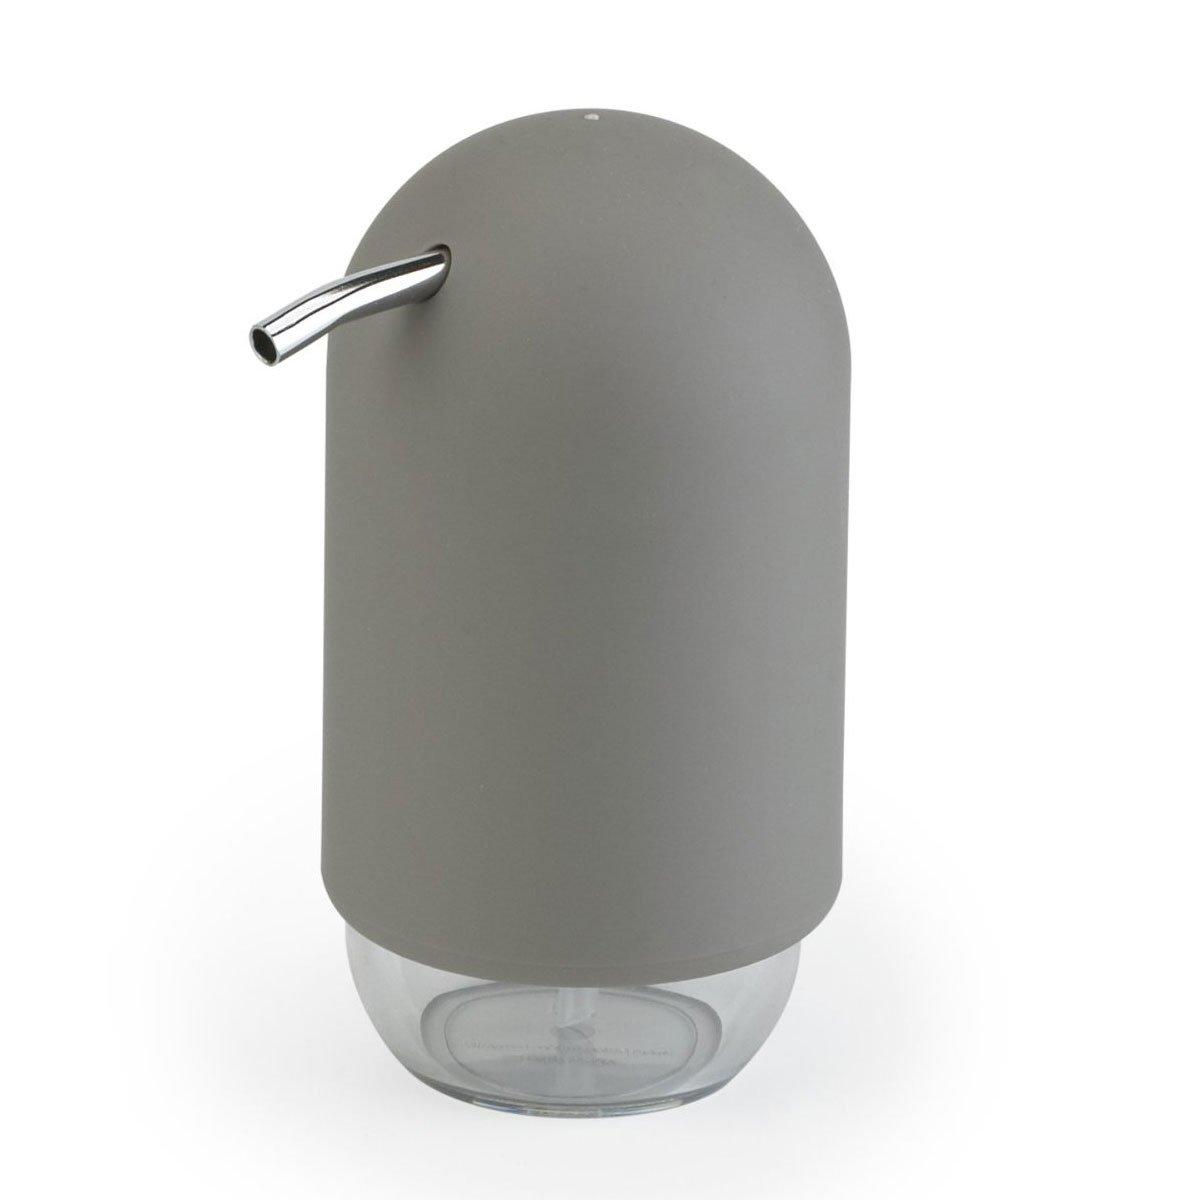 Umbra touch soap pump the green head - Umbra soap dispenser ...